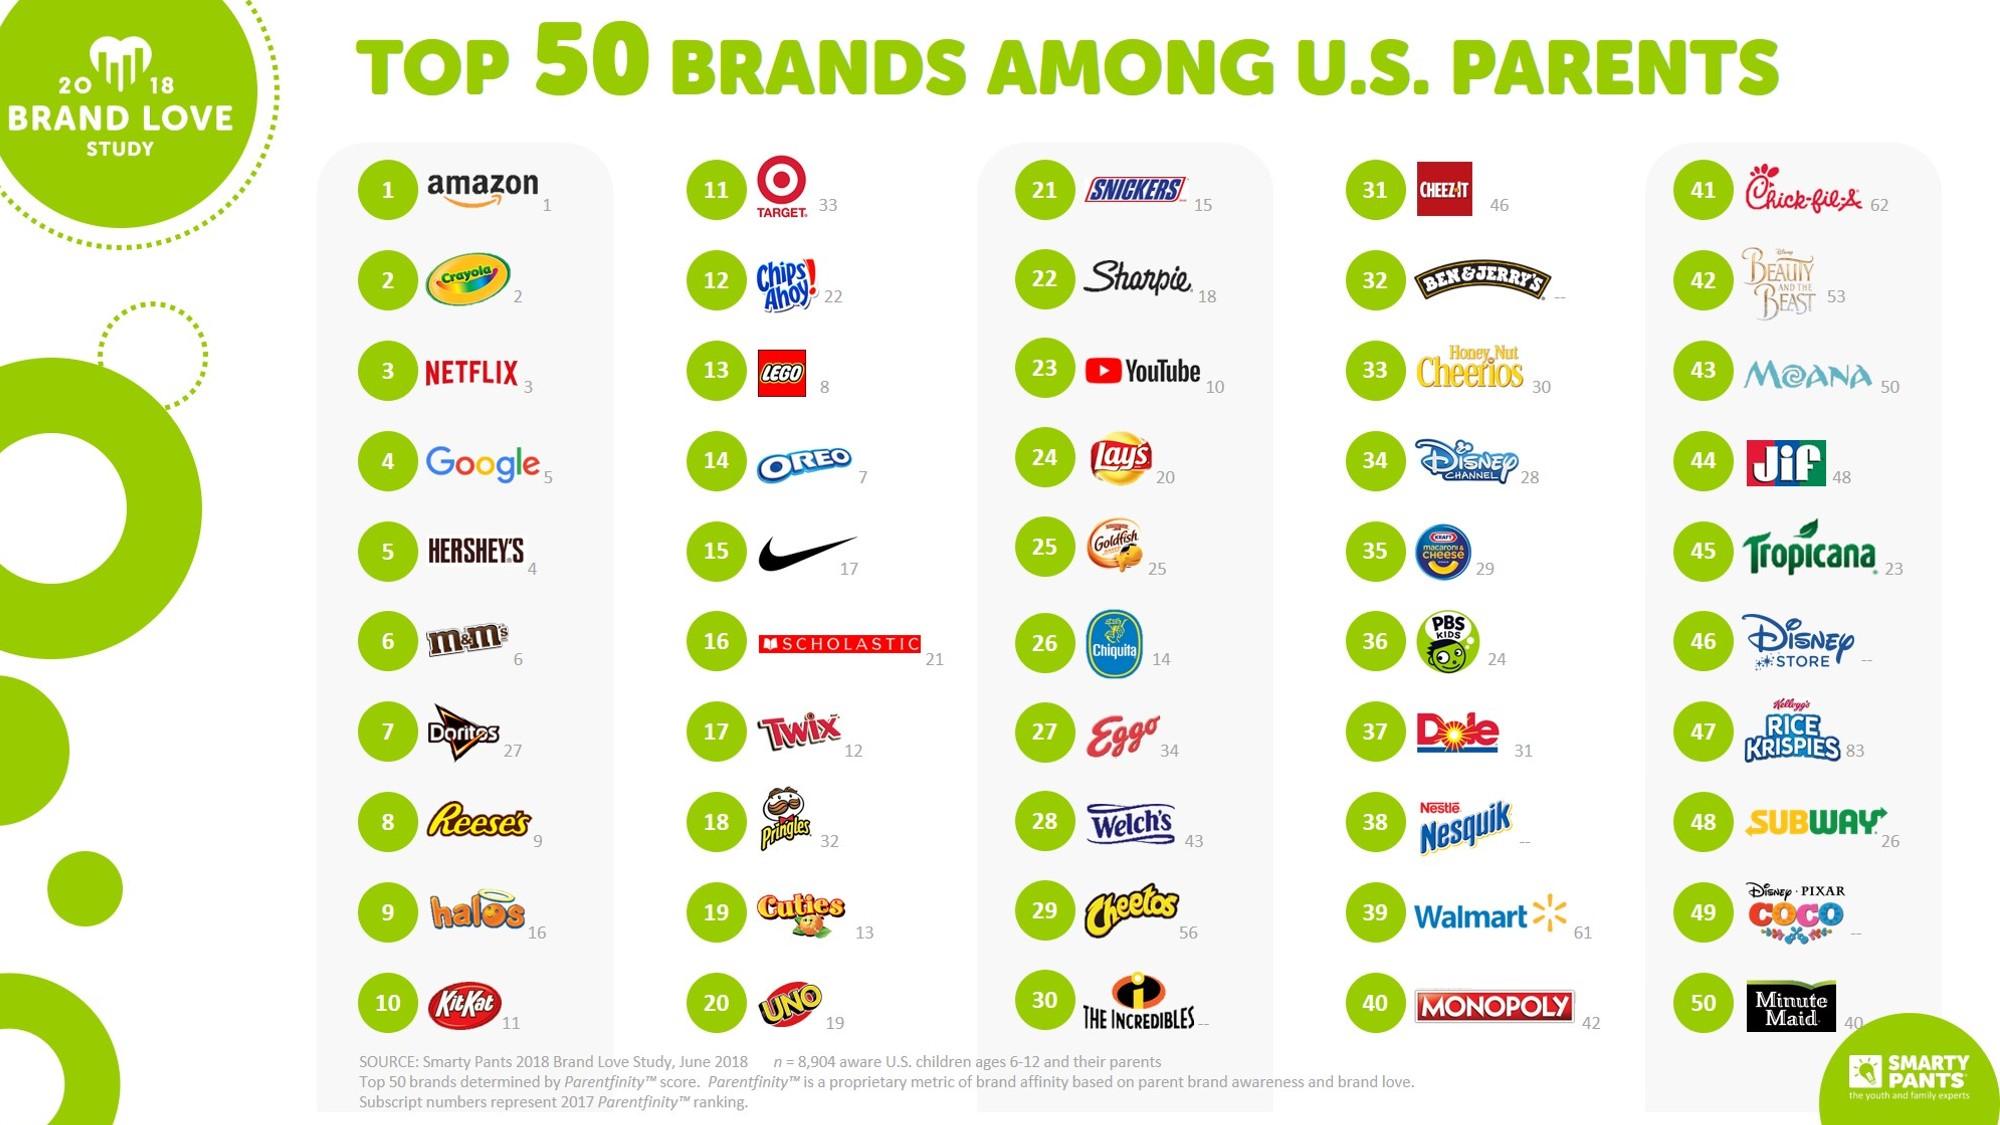 Top 50 Brands Among U.S. Parents